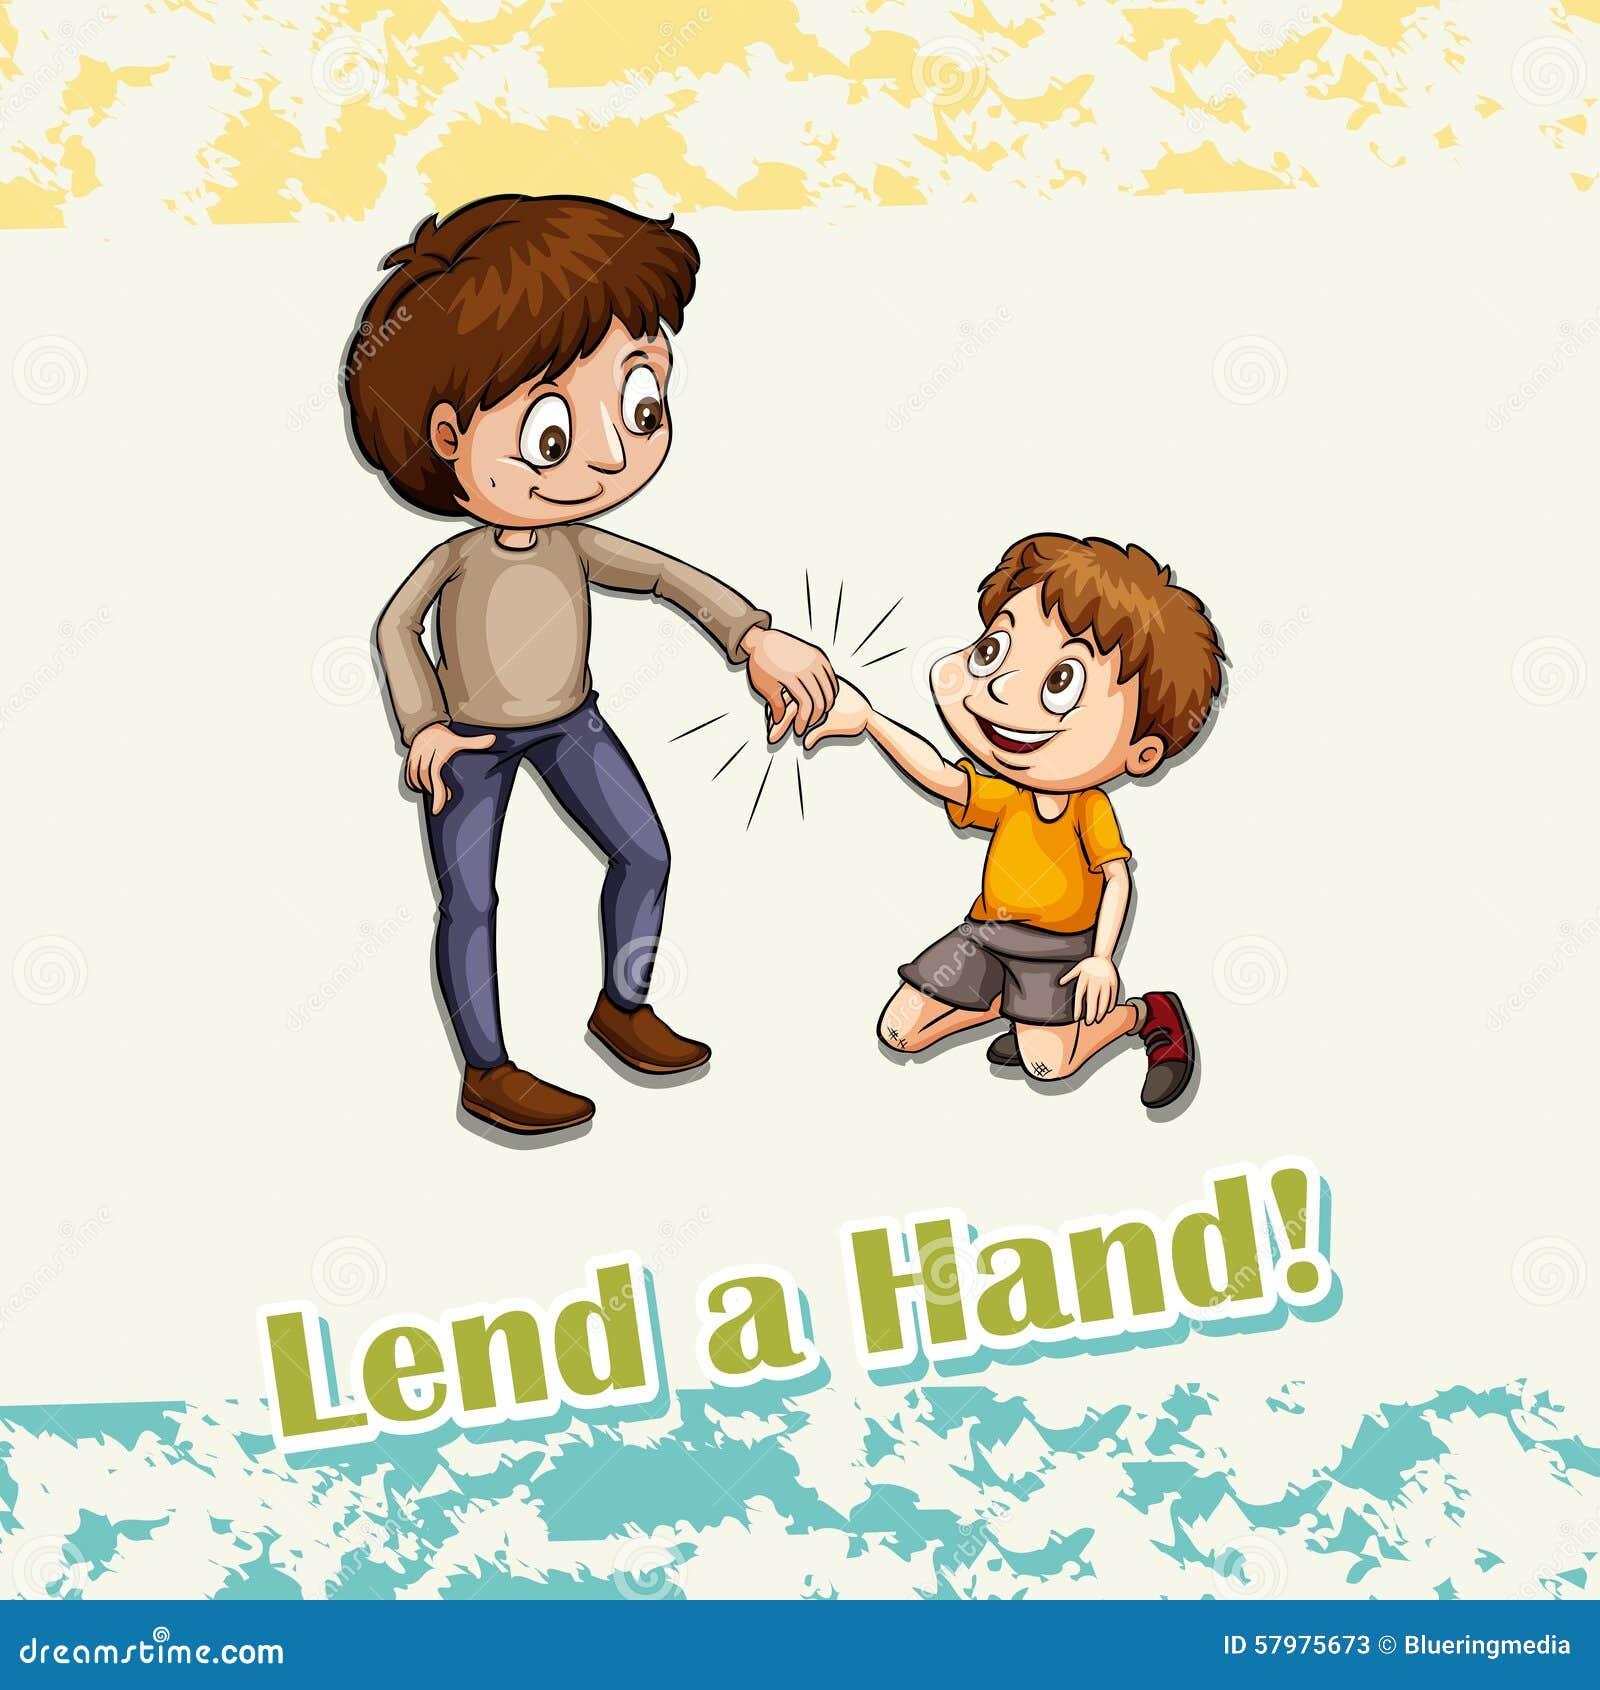 Idiom lend a hand stock vector. Illustration of figurative ...  Idiom lend a ha...